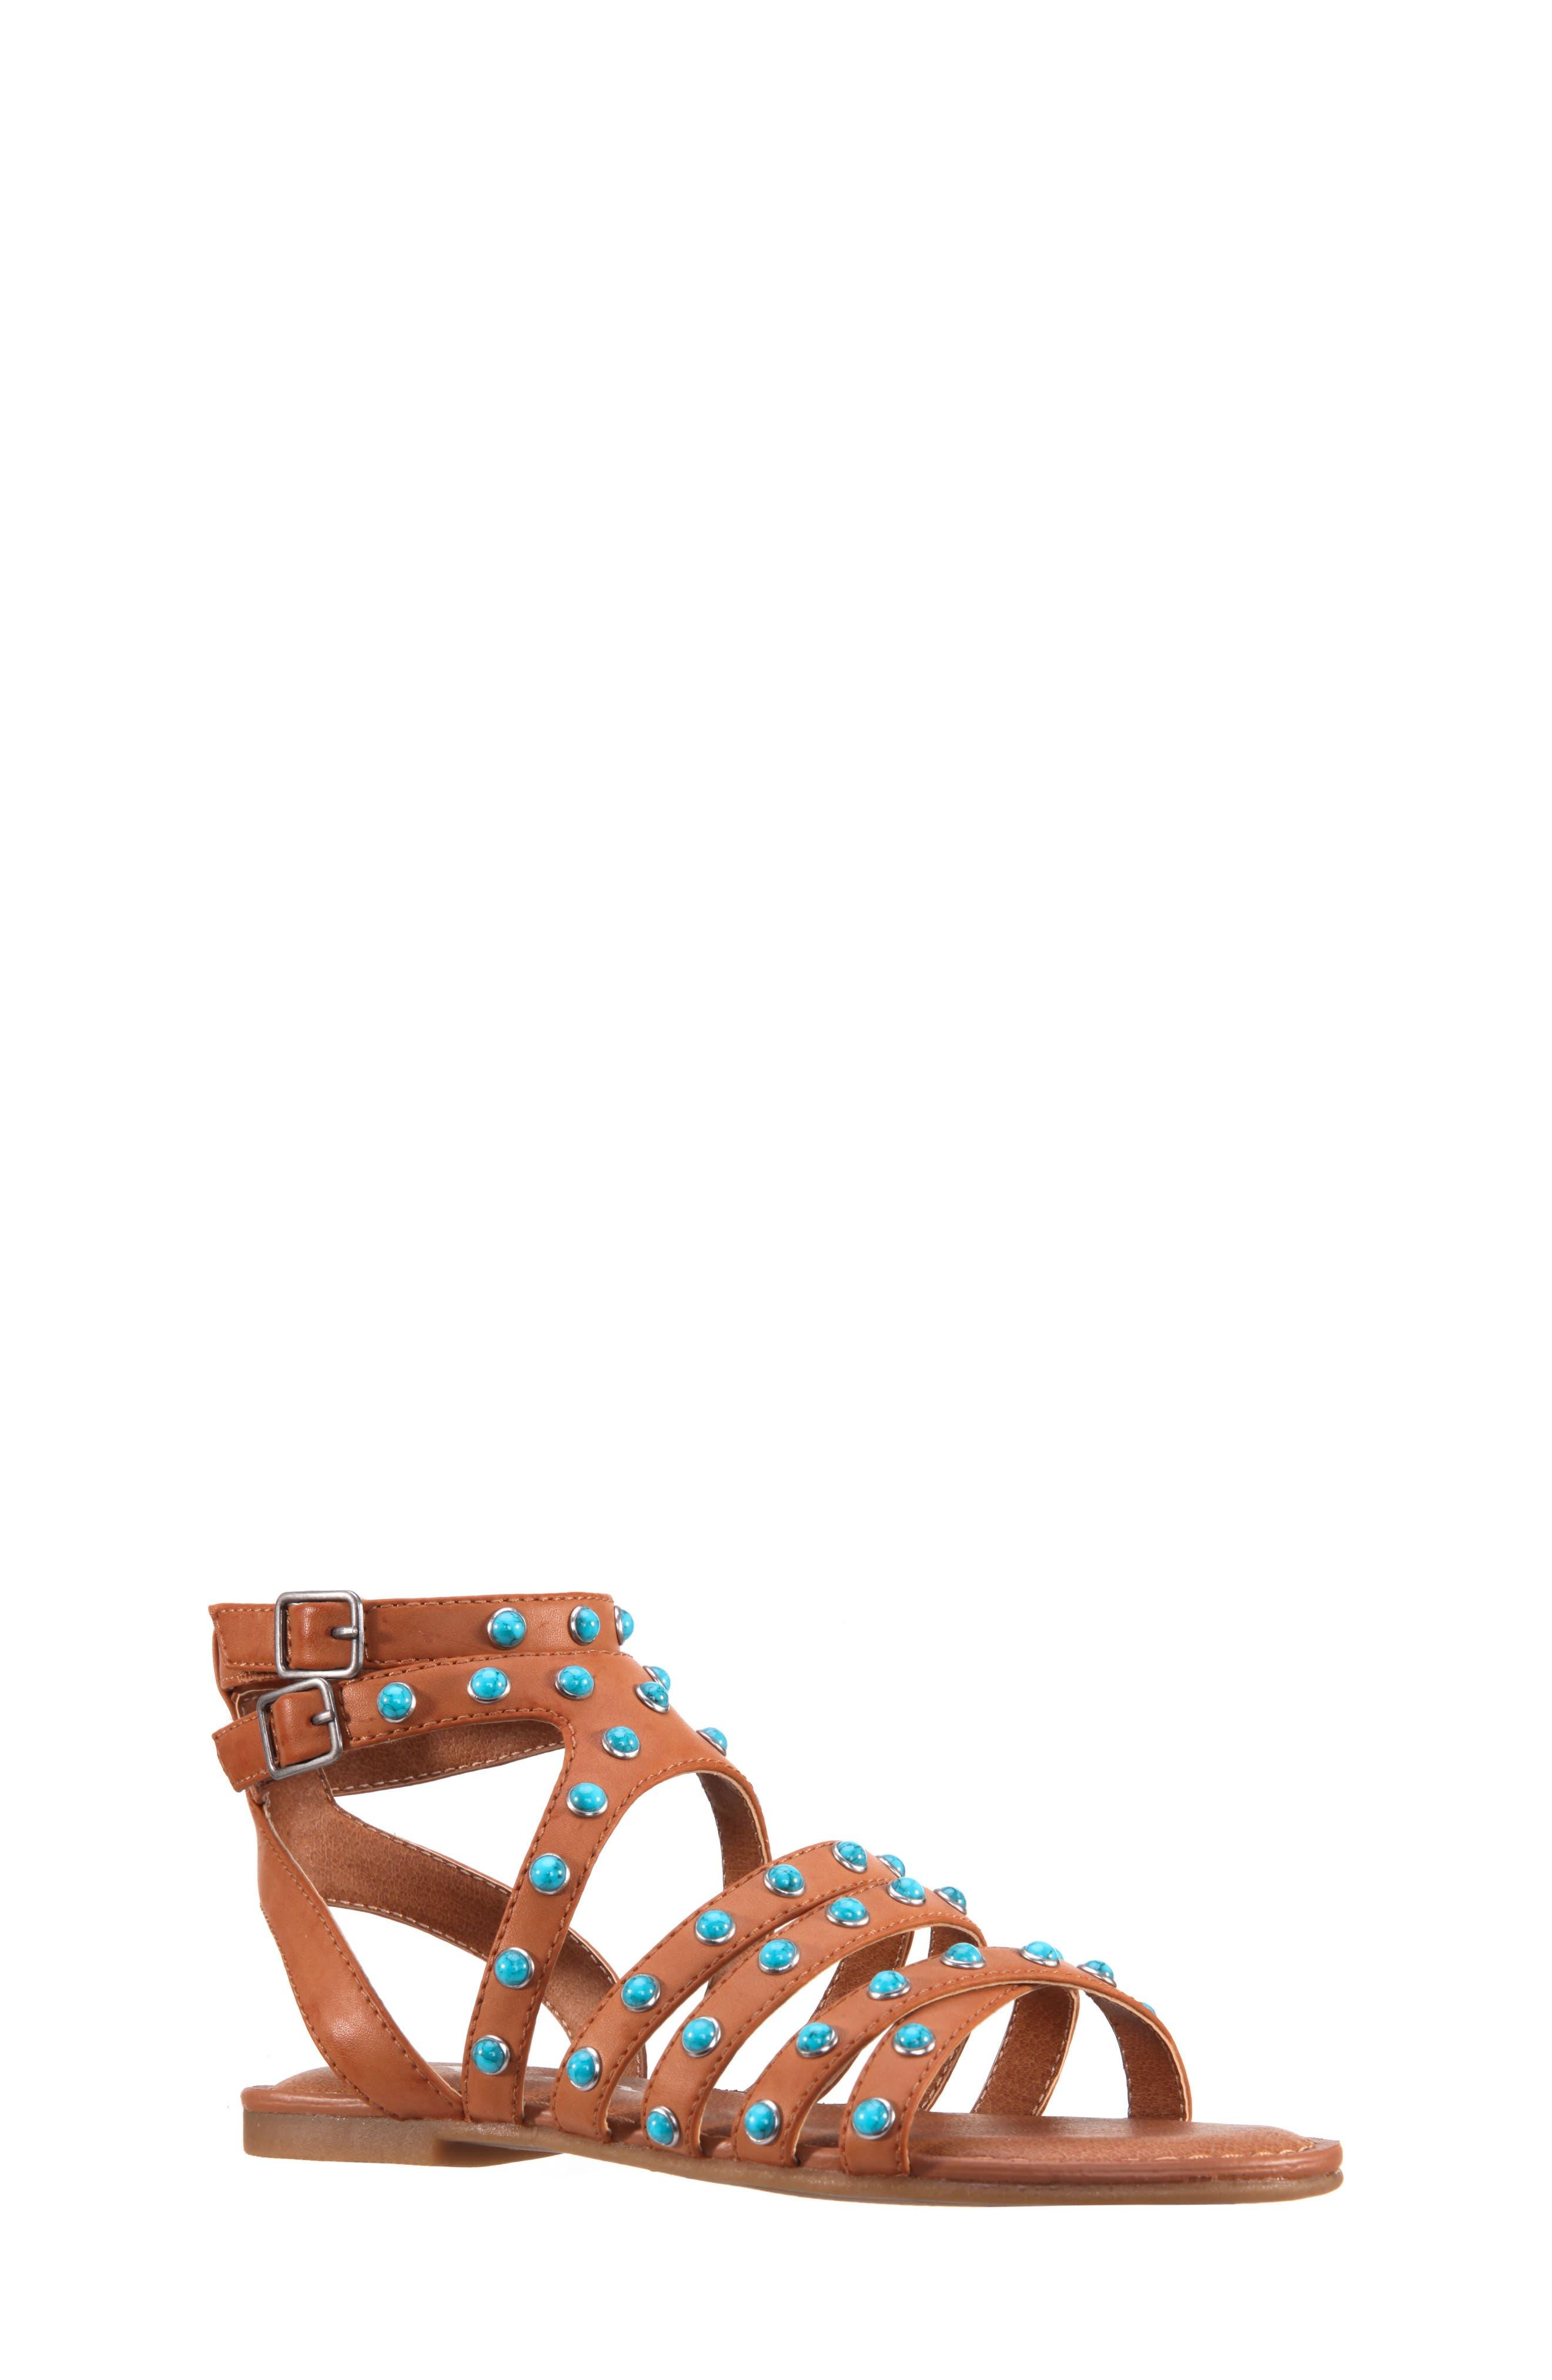 Tammara Studded Gladiator Sandal,                         Main,                         color, Tan Burnished